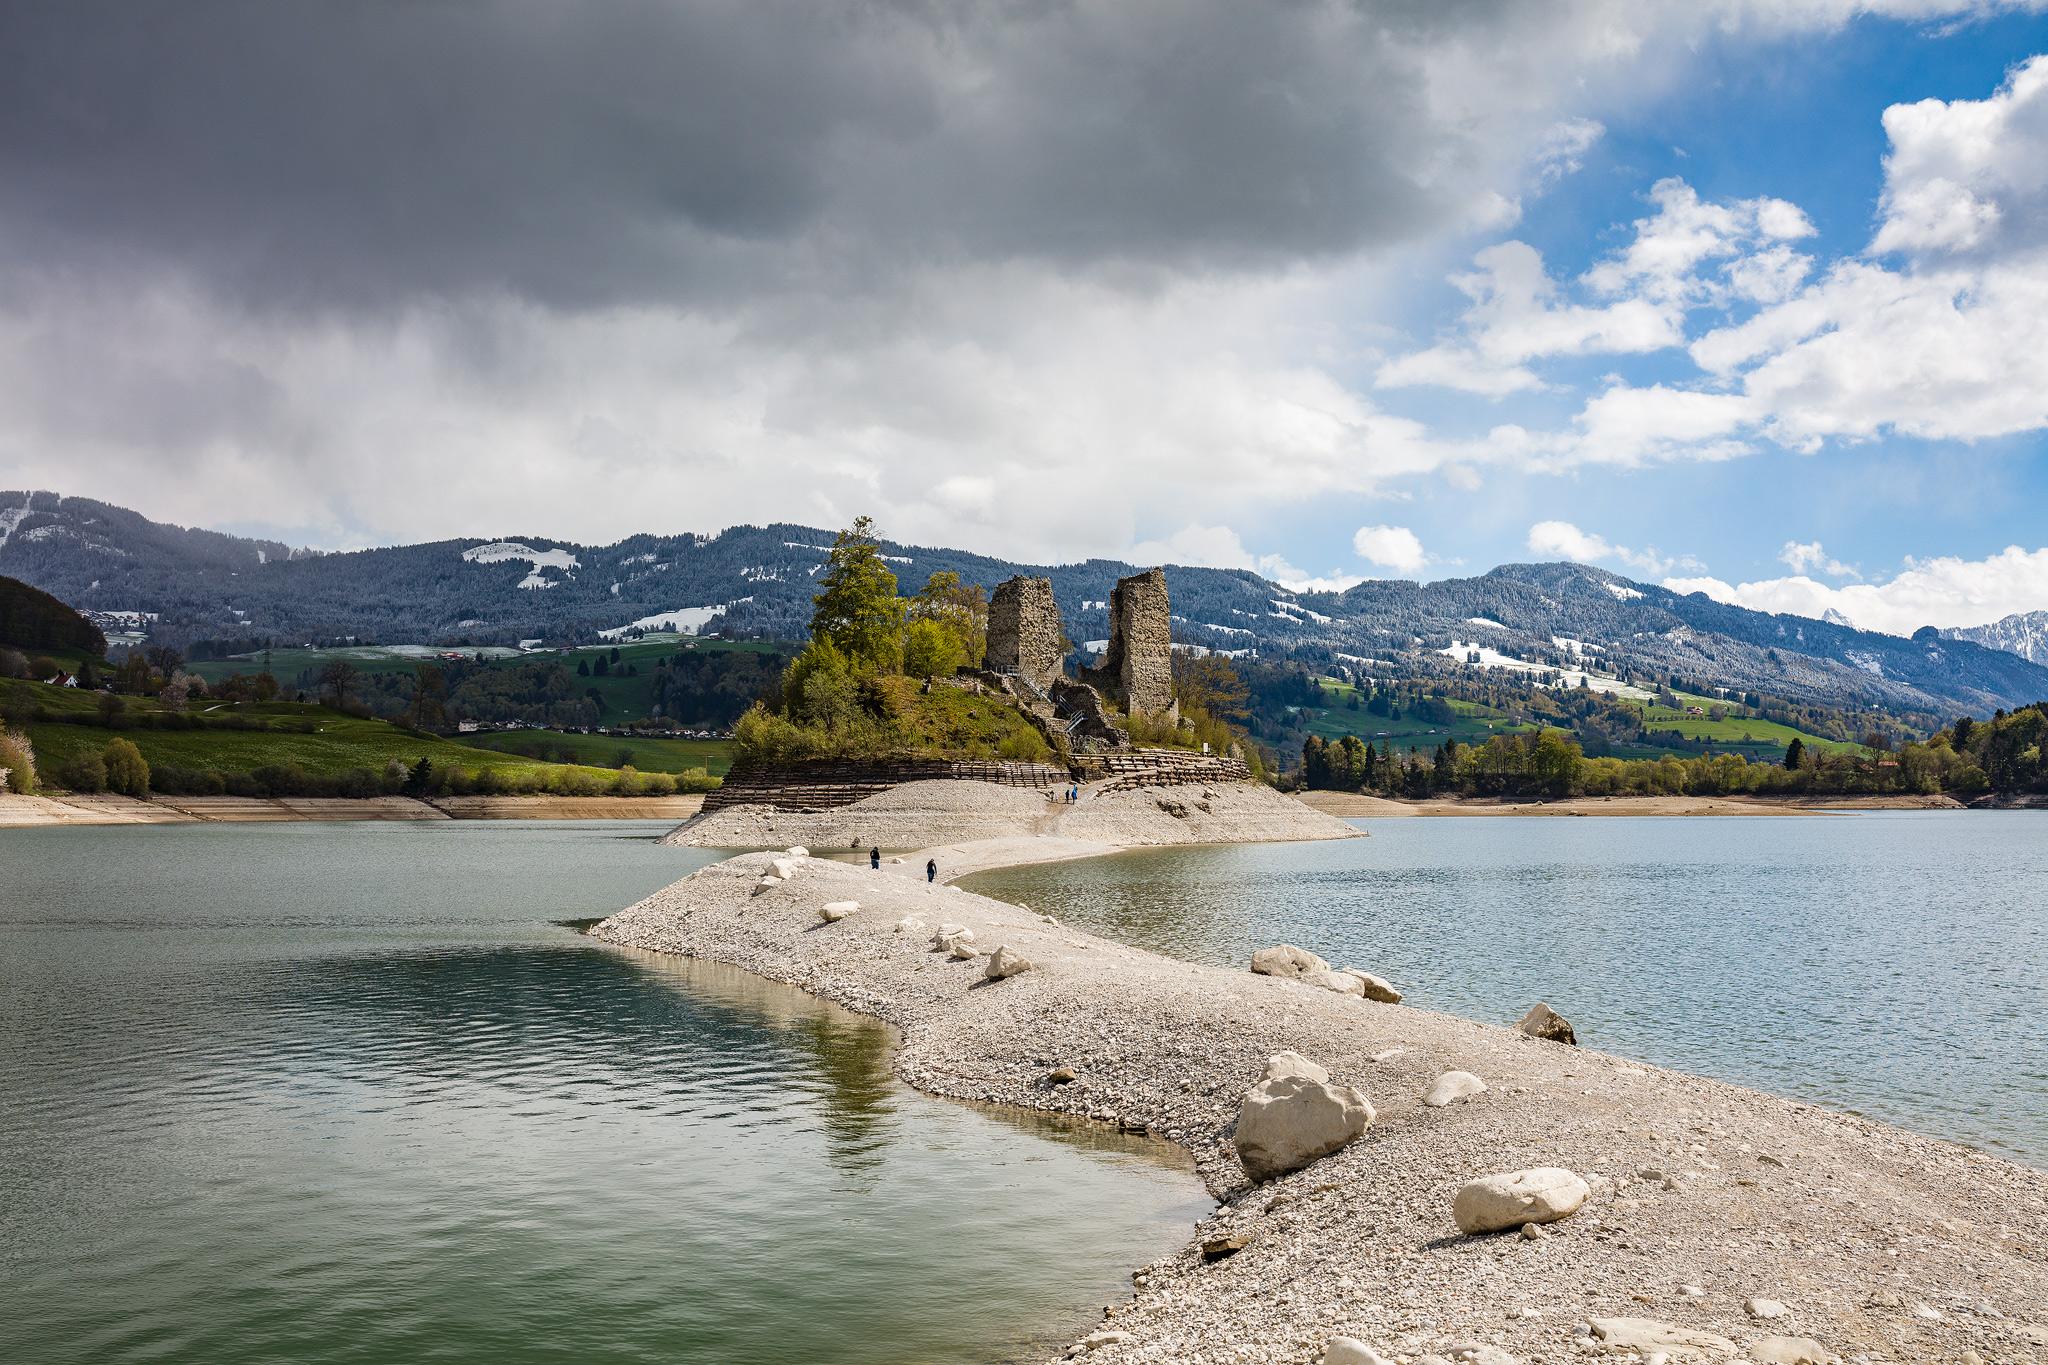 Ild d'Ogoz, Gruyère, Switzerland.